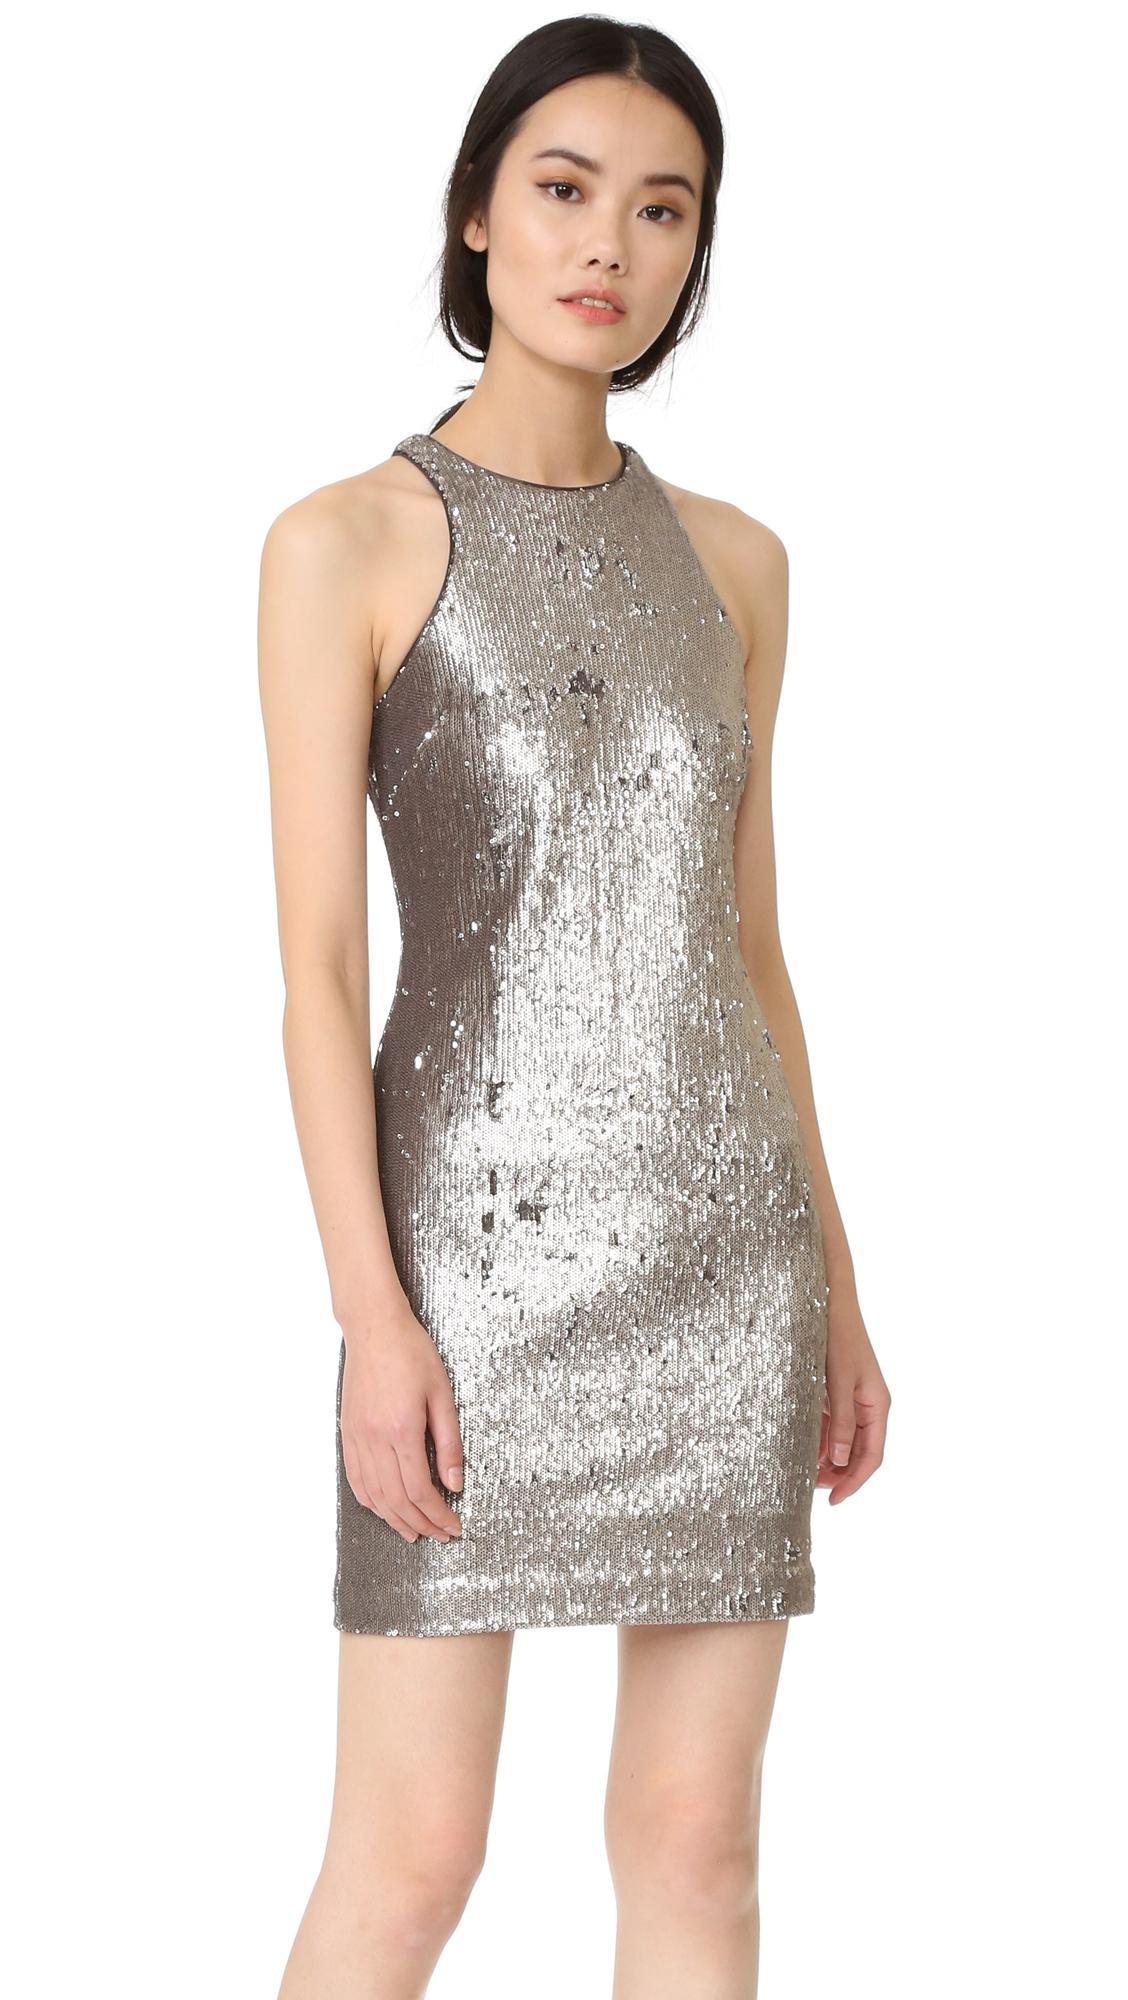 Halston Heritage Racer Back Sequined Dress - Antique Silver